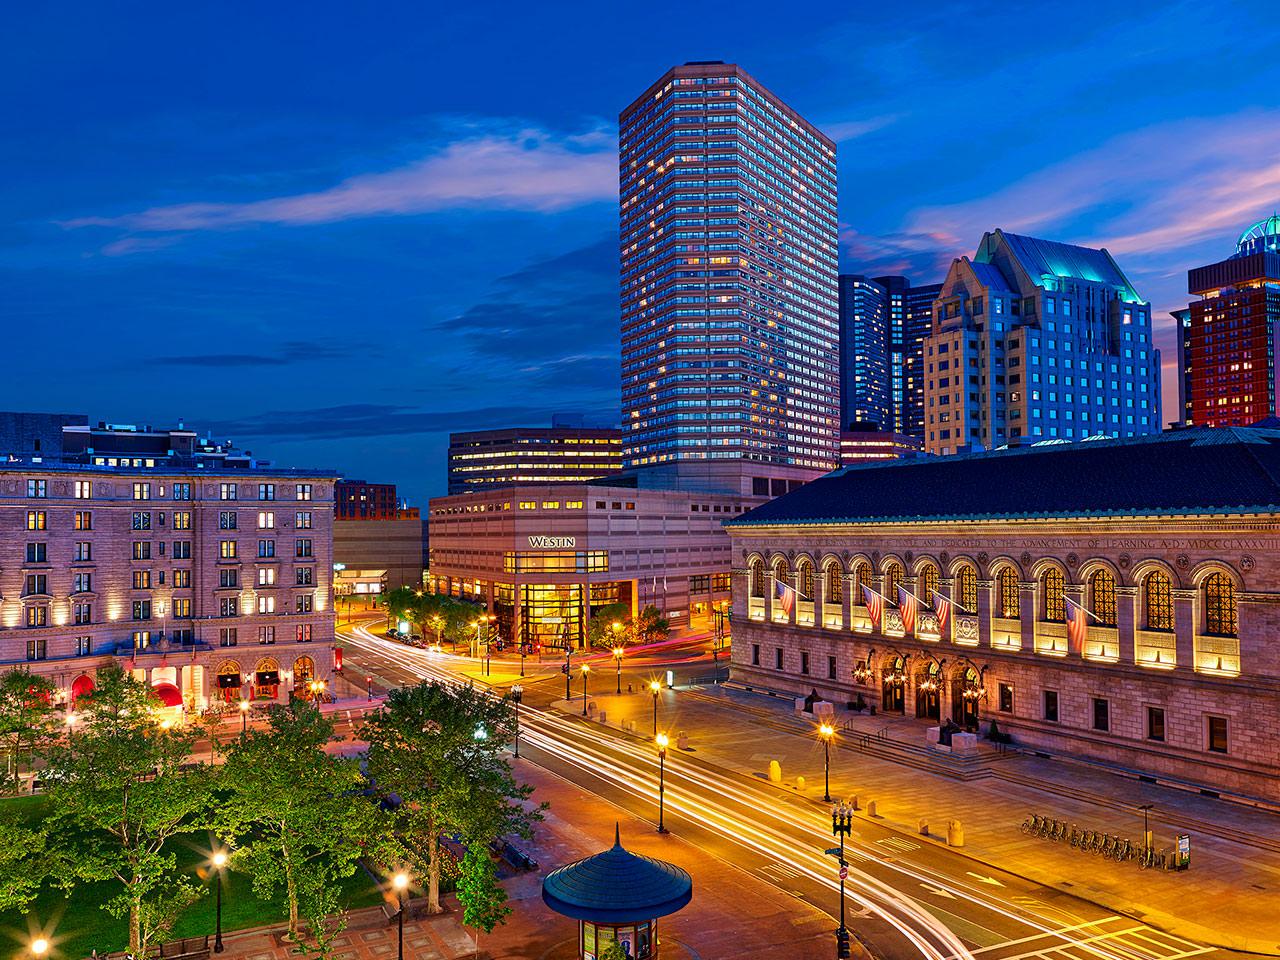 Boston venue